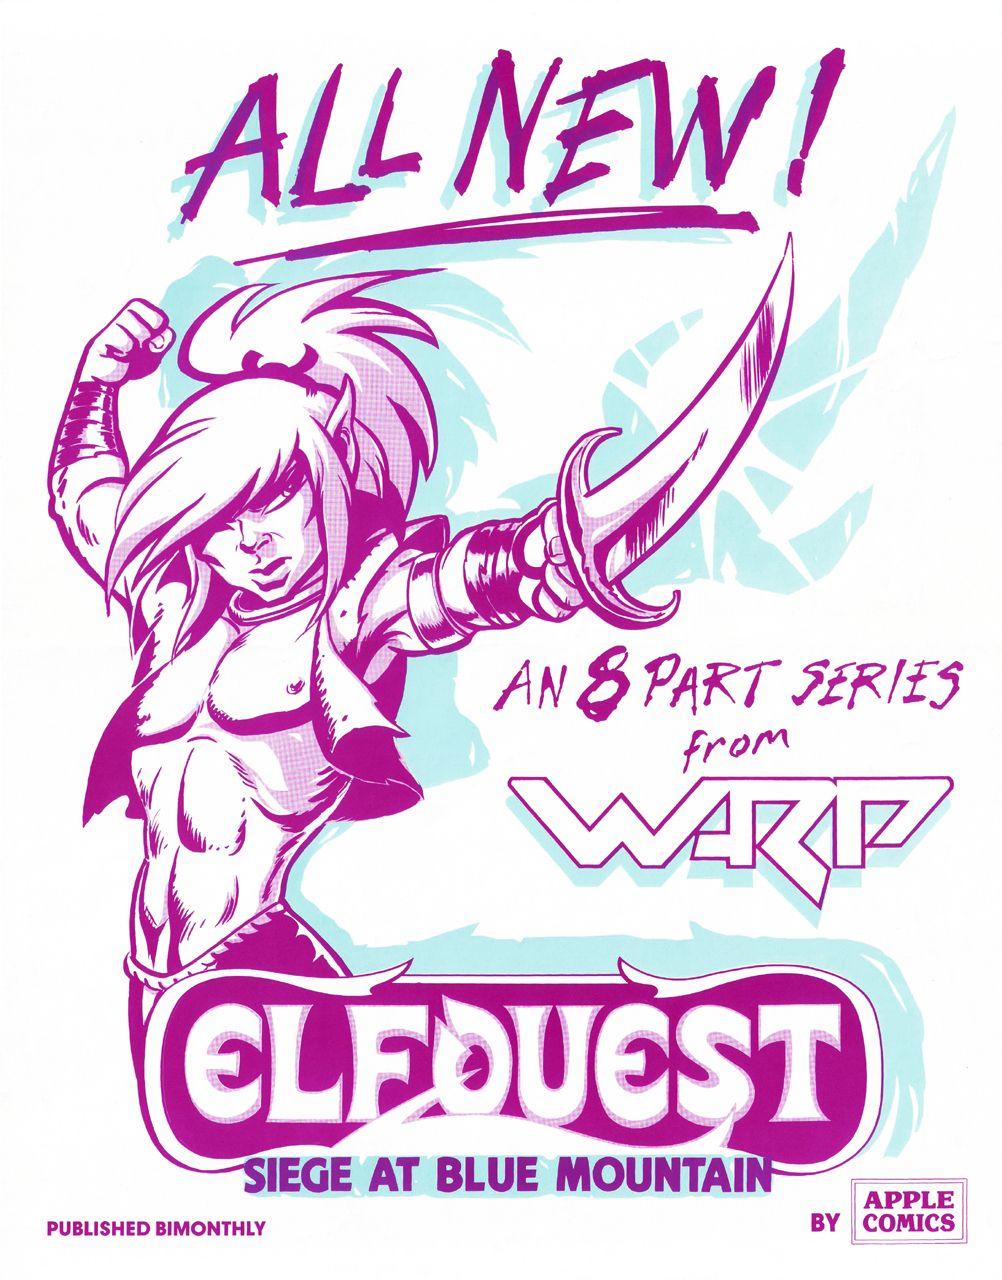 Elfquest siege at blue mountain teaser art by wendy pini